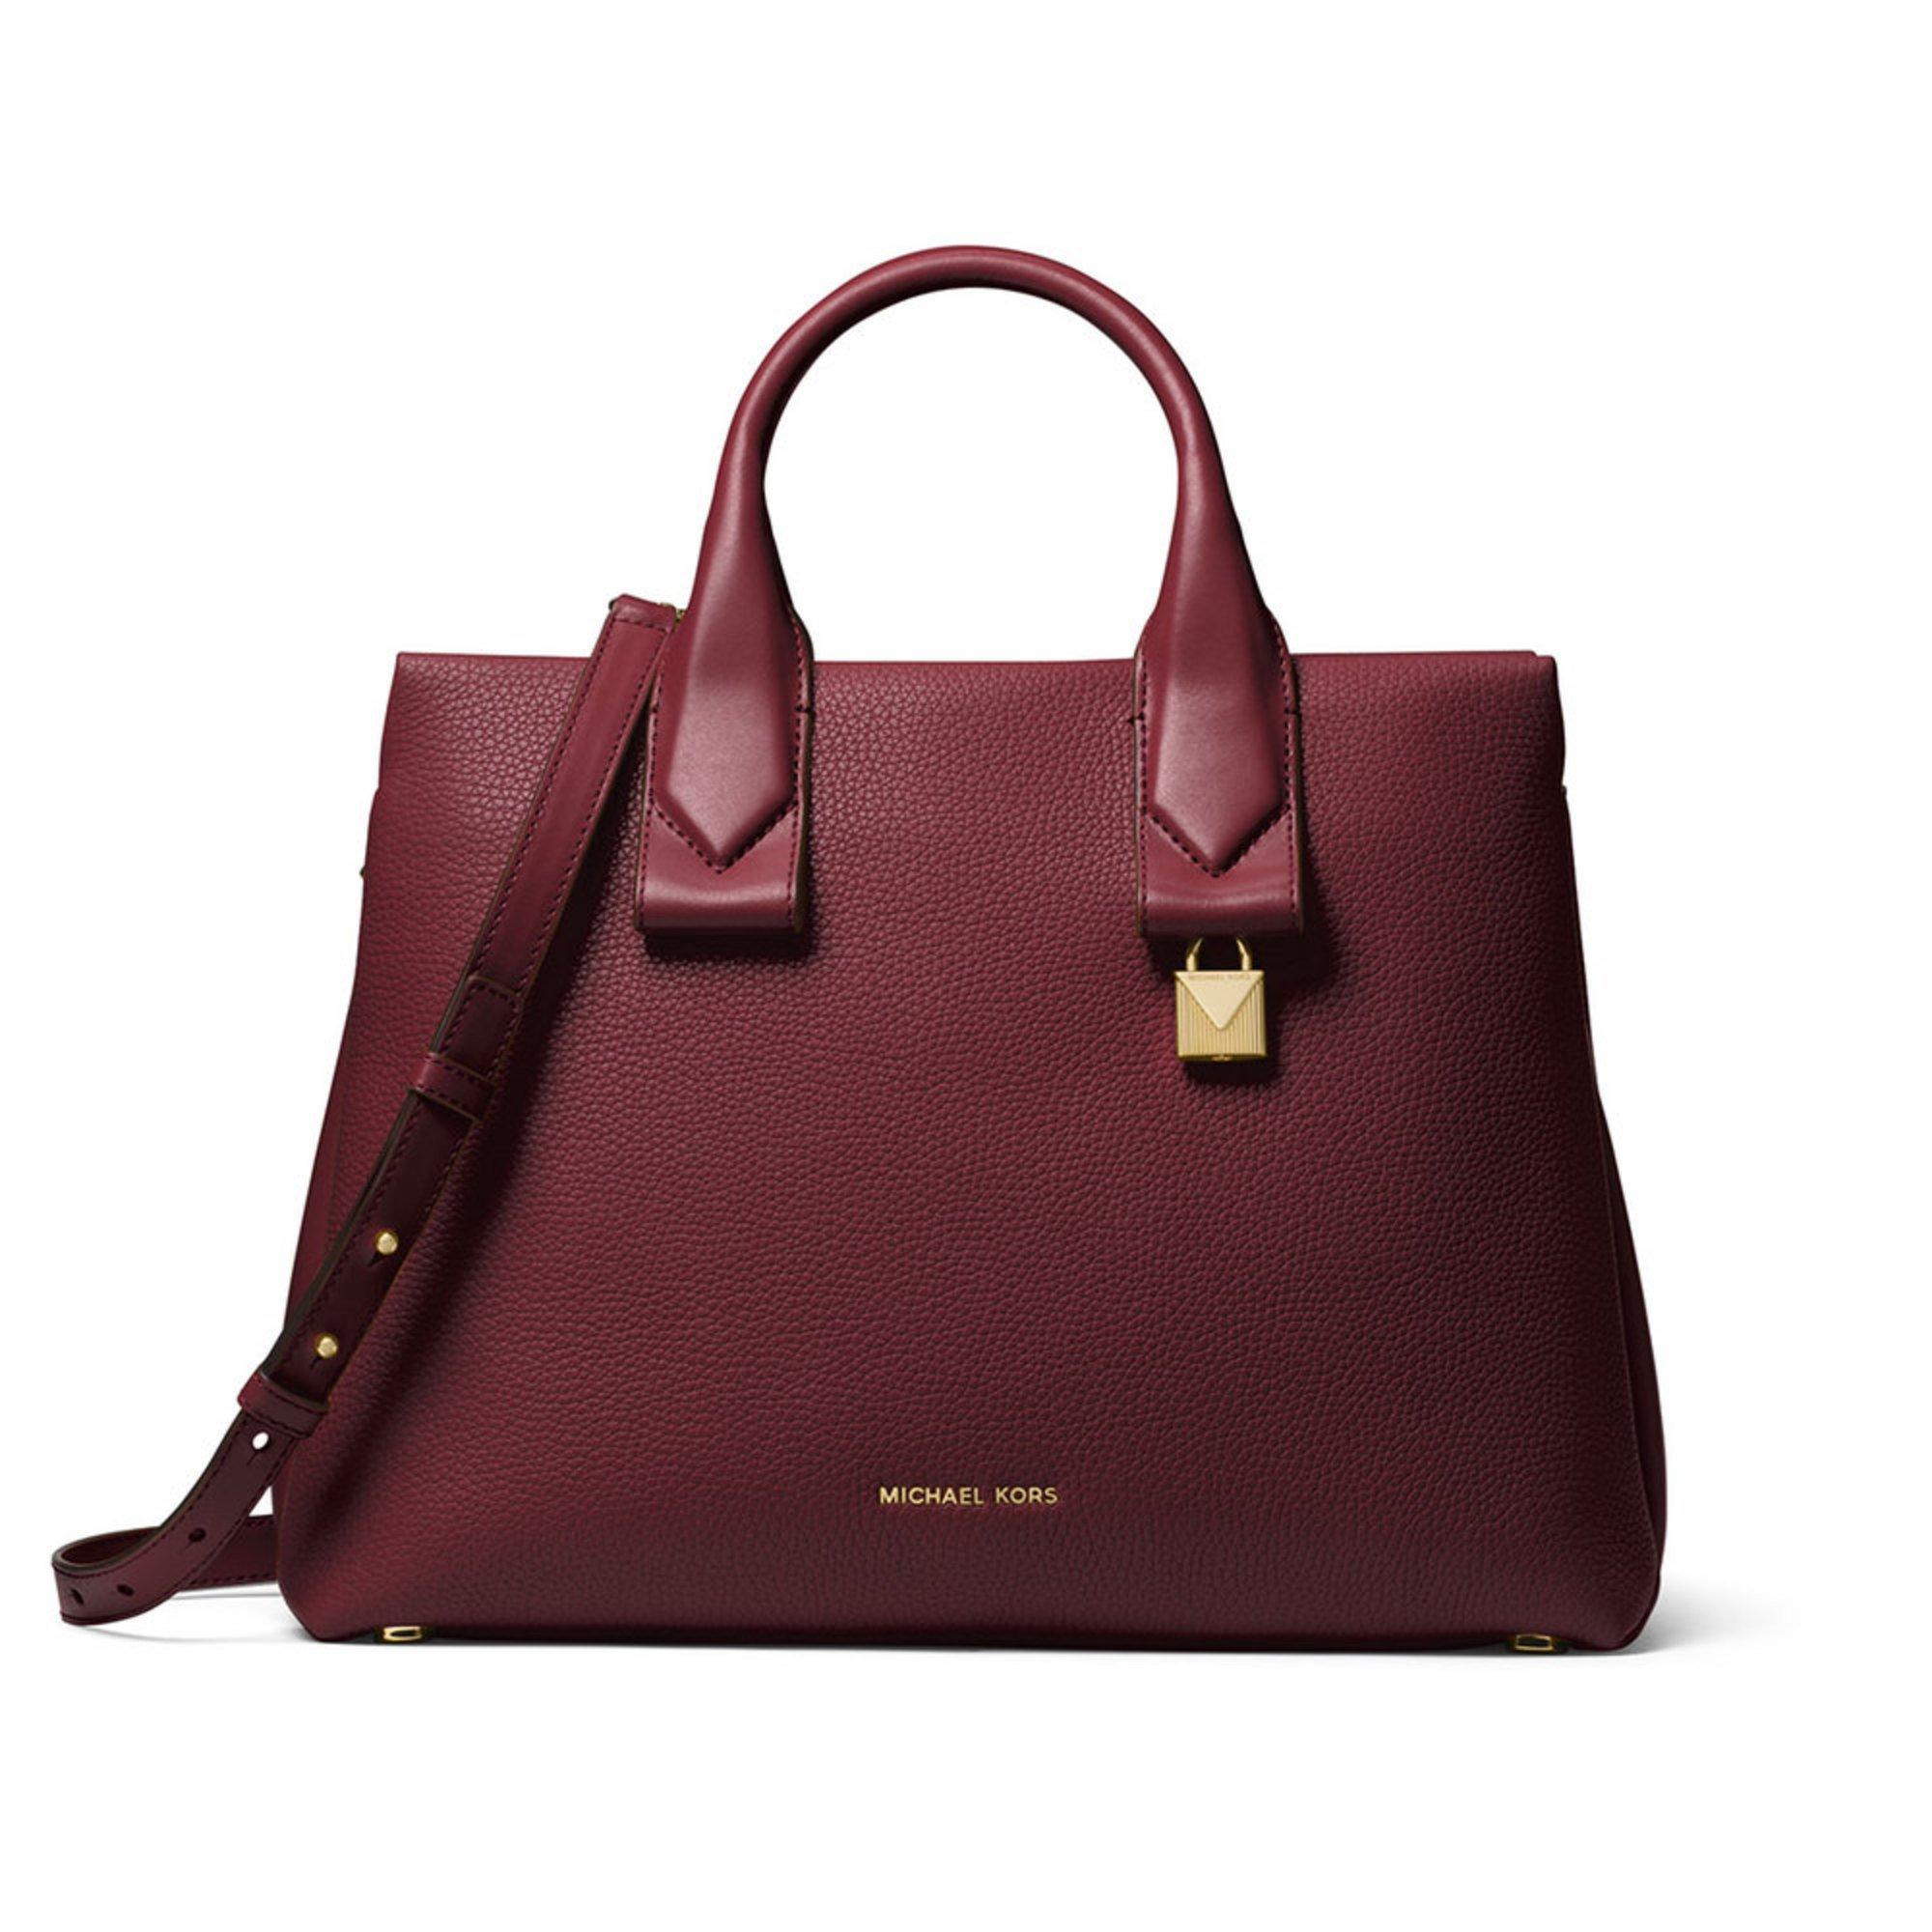 Michael Kors Rollins Large Satchel Satchels Handbags Sungl Your Navy Exchange Official Site